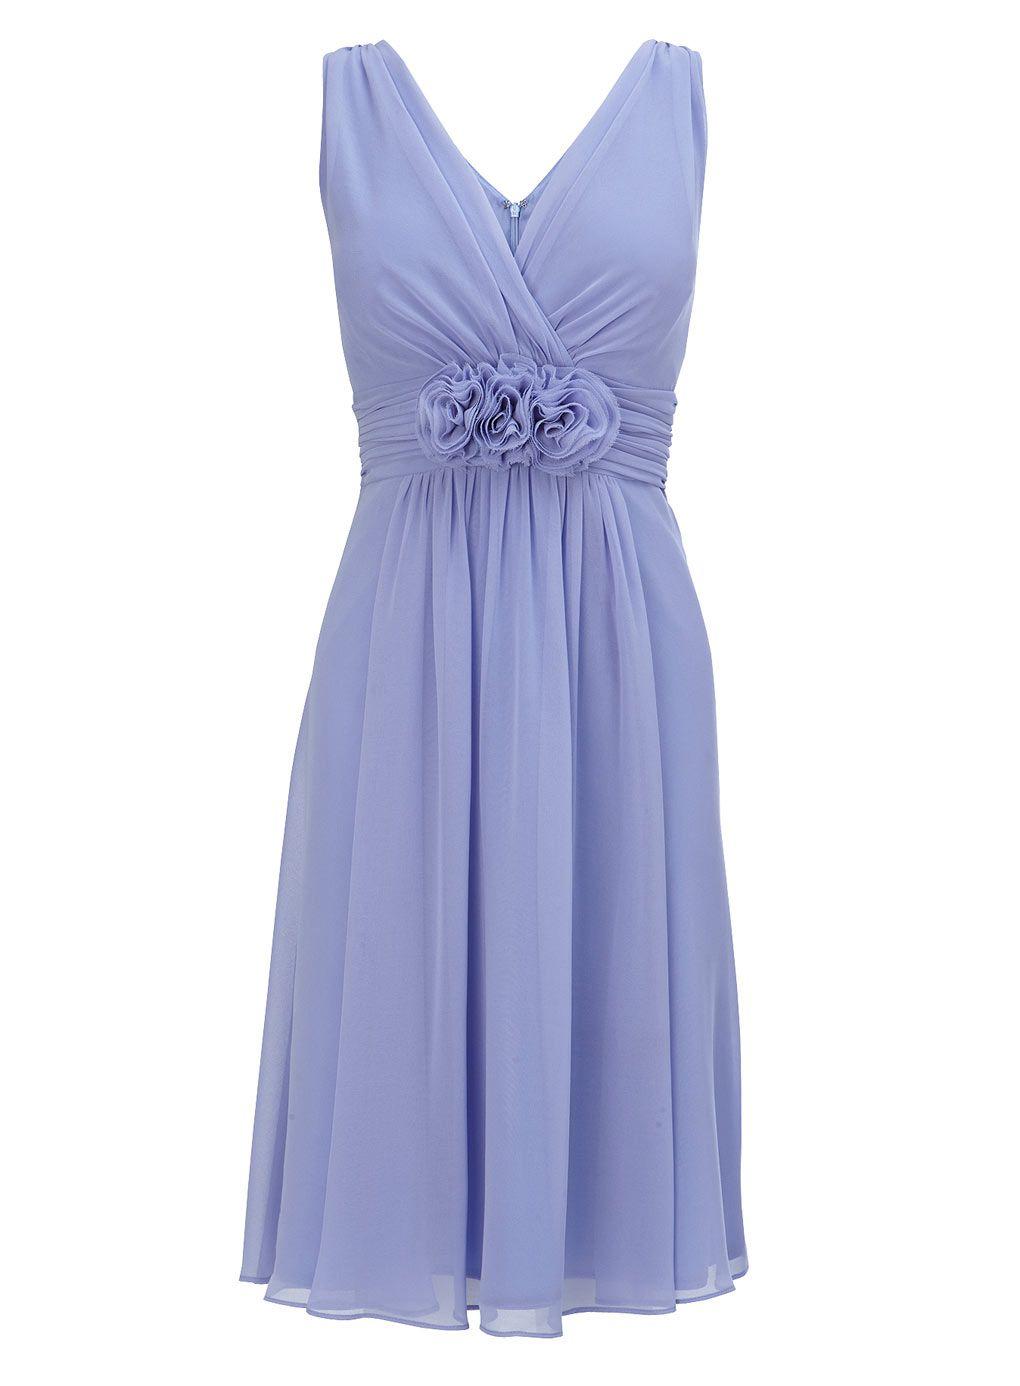 Ruby Cornflower Short Dress - adult bridesmaids - Wedding - BHS ...